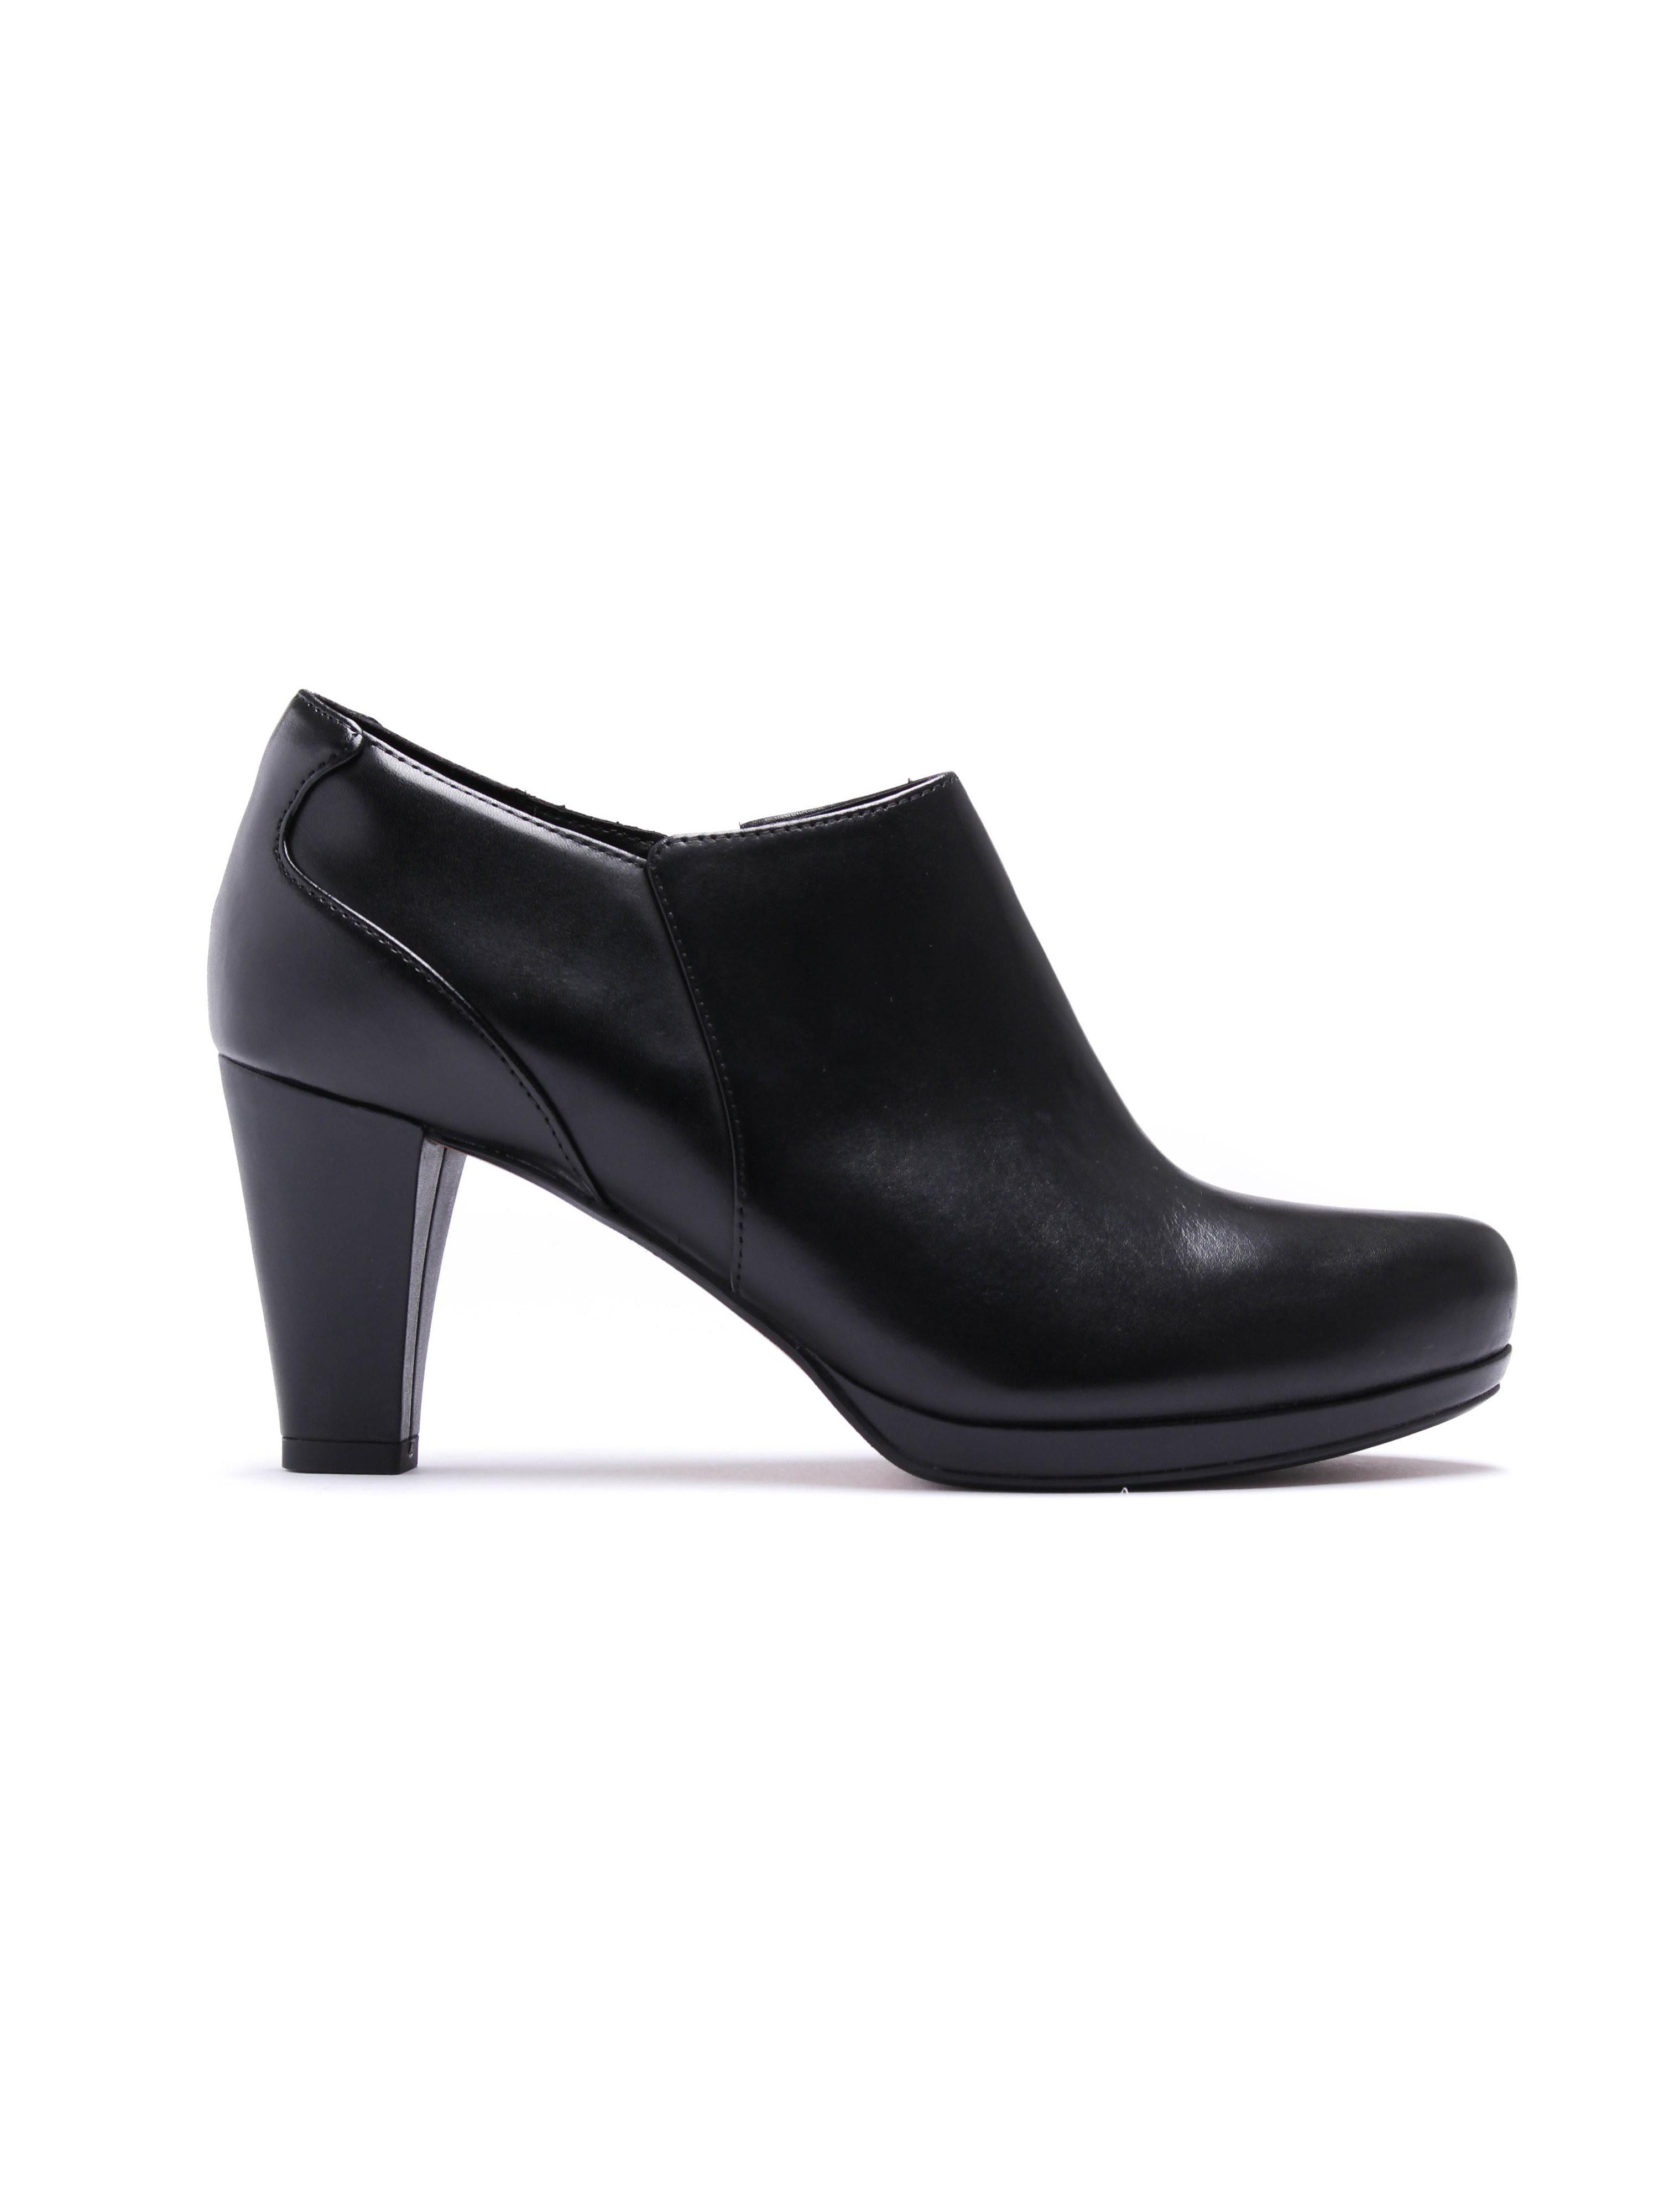 Clarks Women's Chorus True Leather Shoes - Black